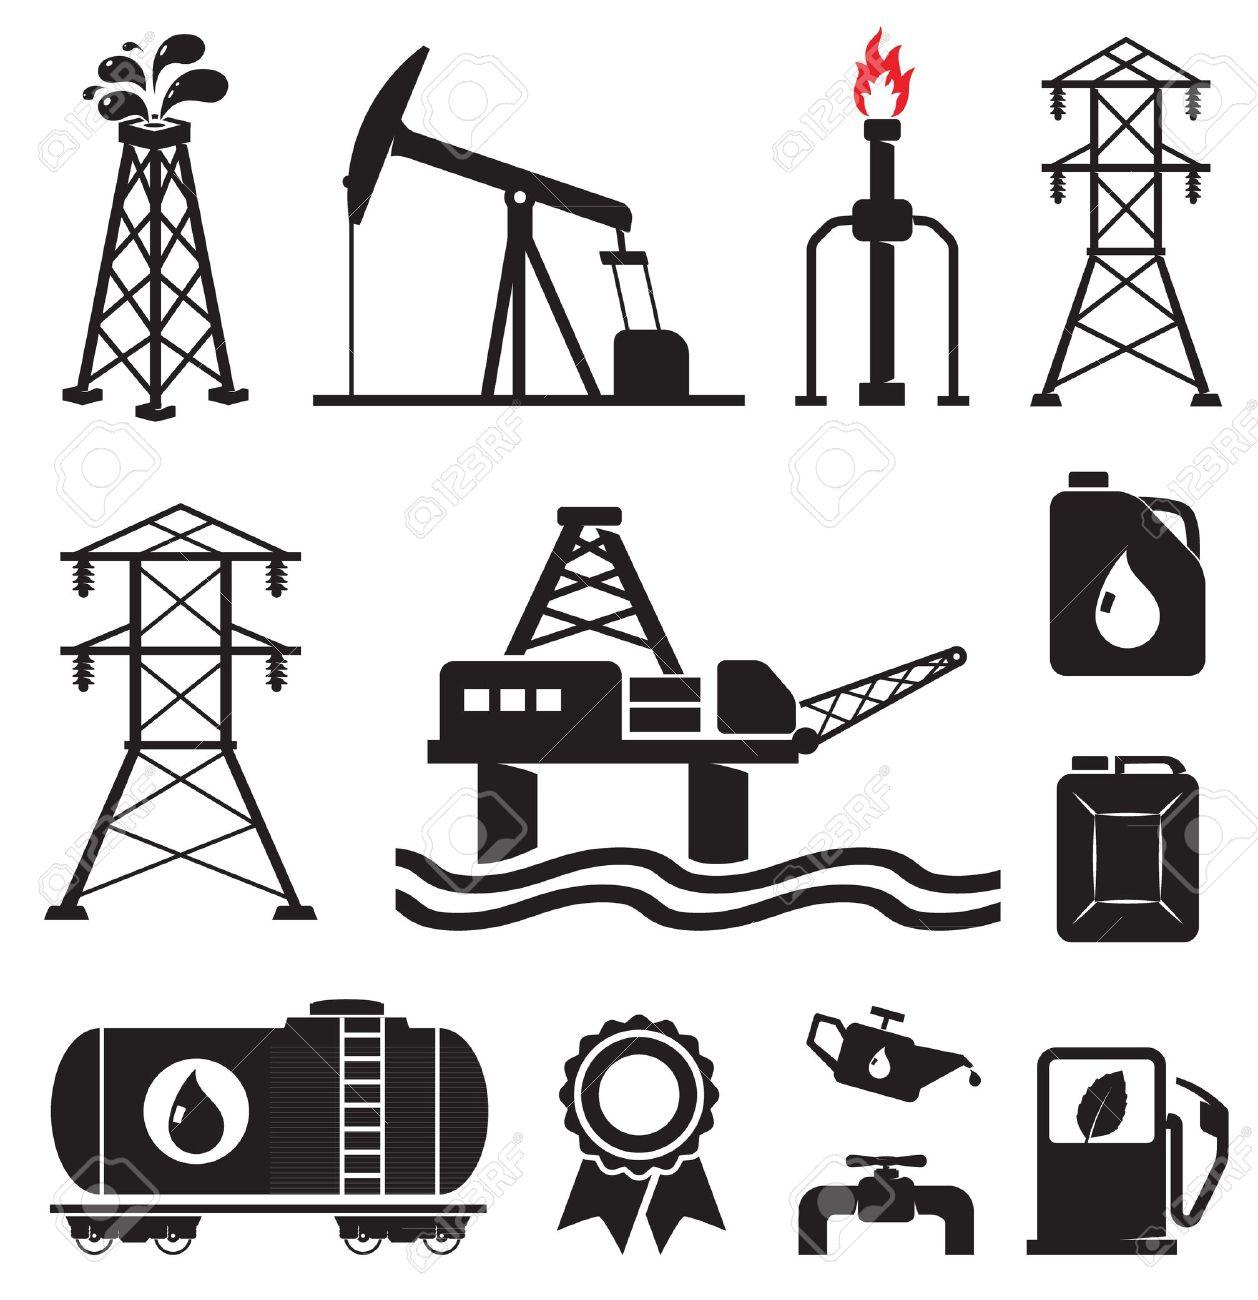 Oil gas electricity symbols royalty free cliparts vectors and oil gas electricity symbols stock vector 13295511 biocorpaavc